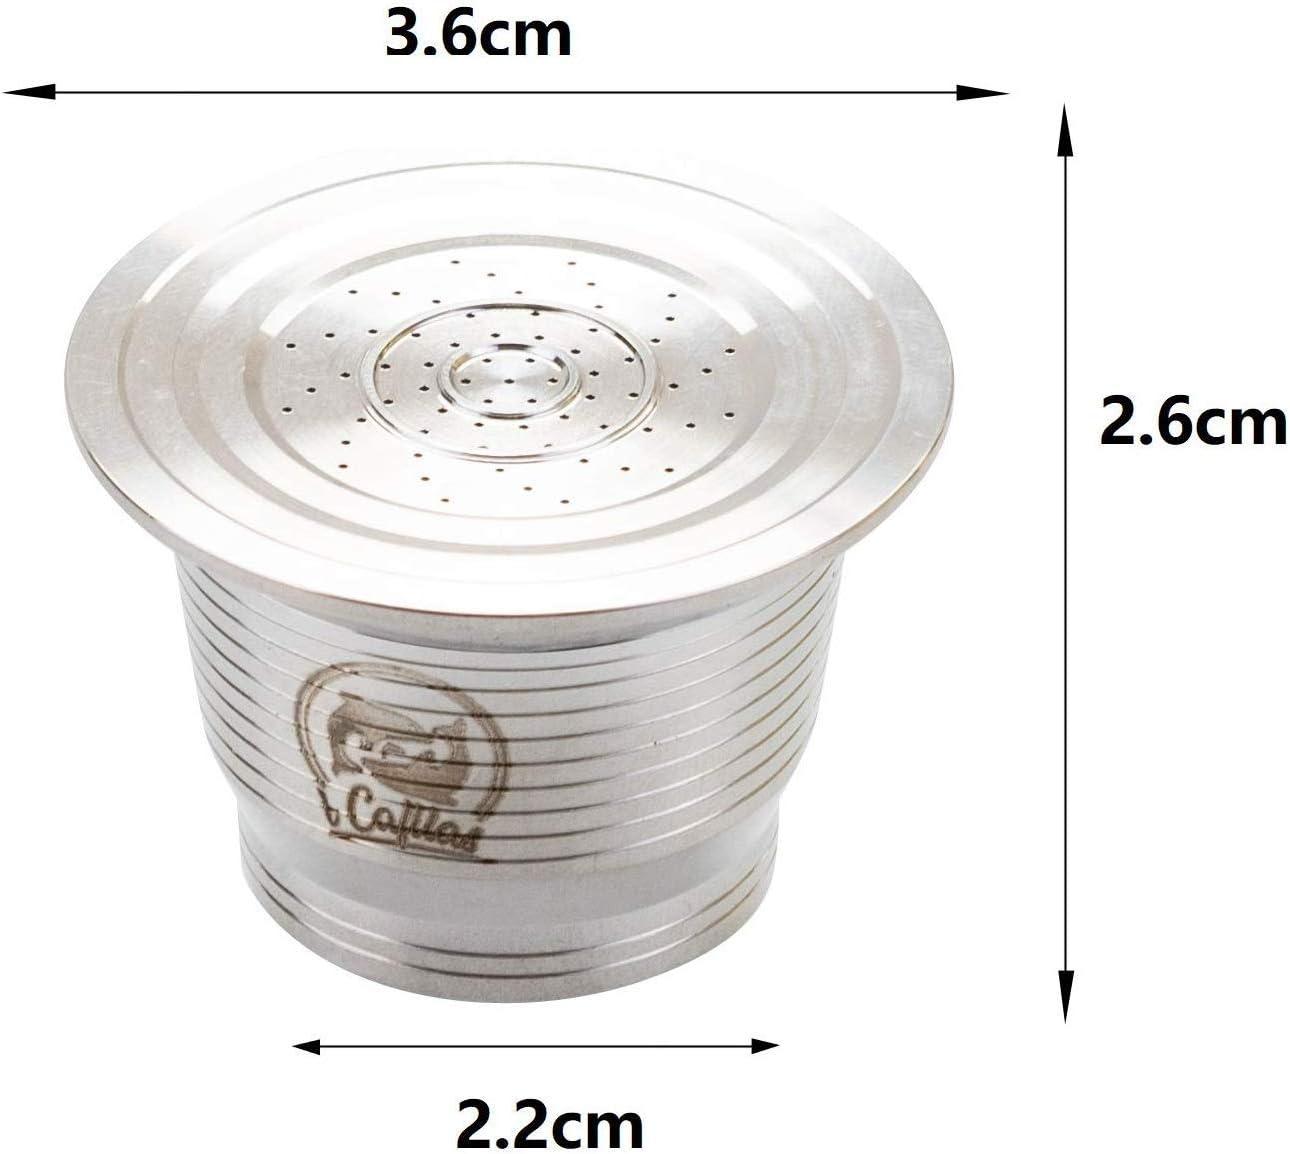 SOPRETY - Cápsula de café reutilizable de acero inoxidable con ...